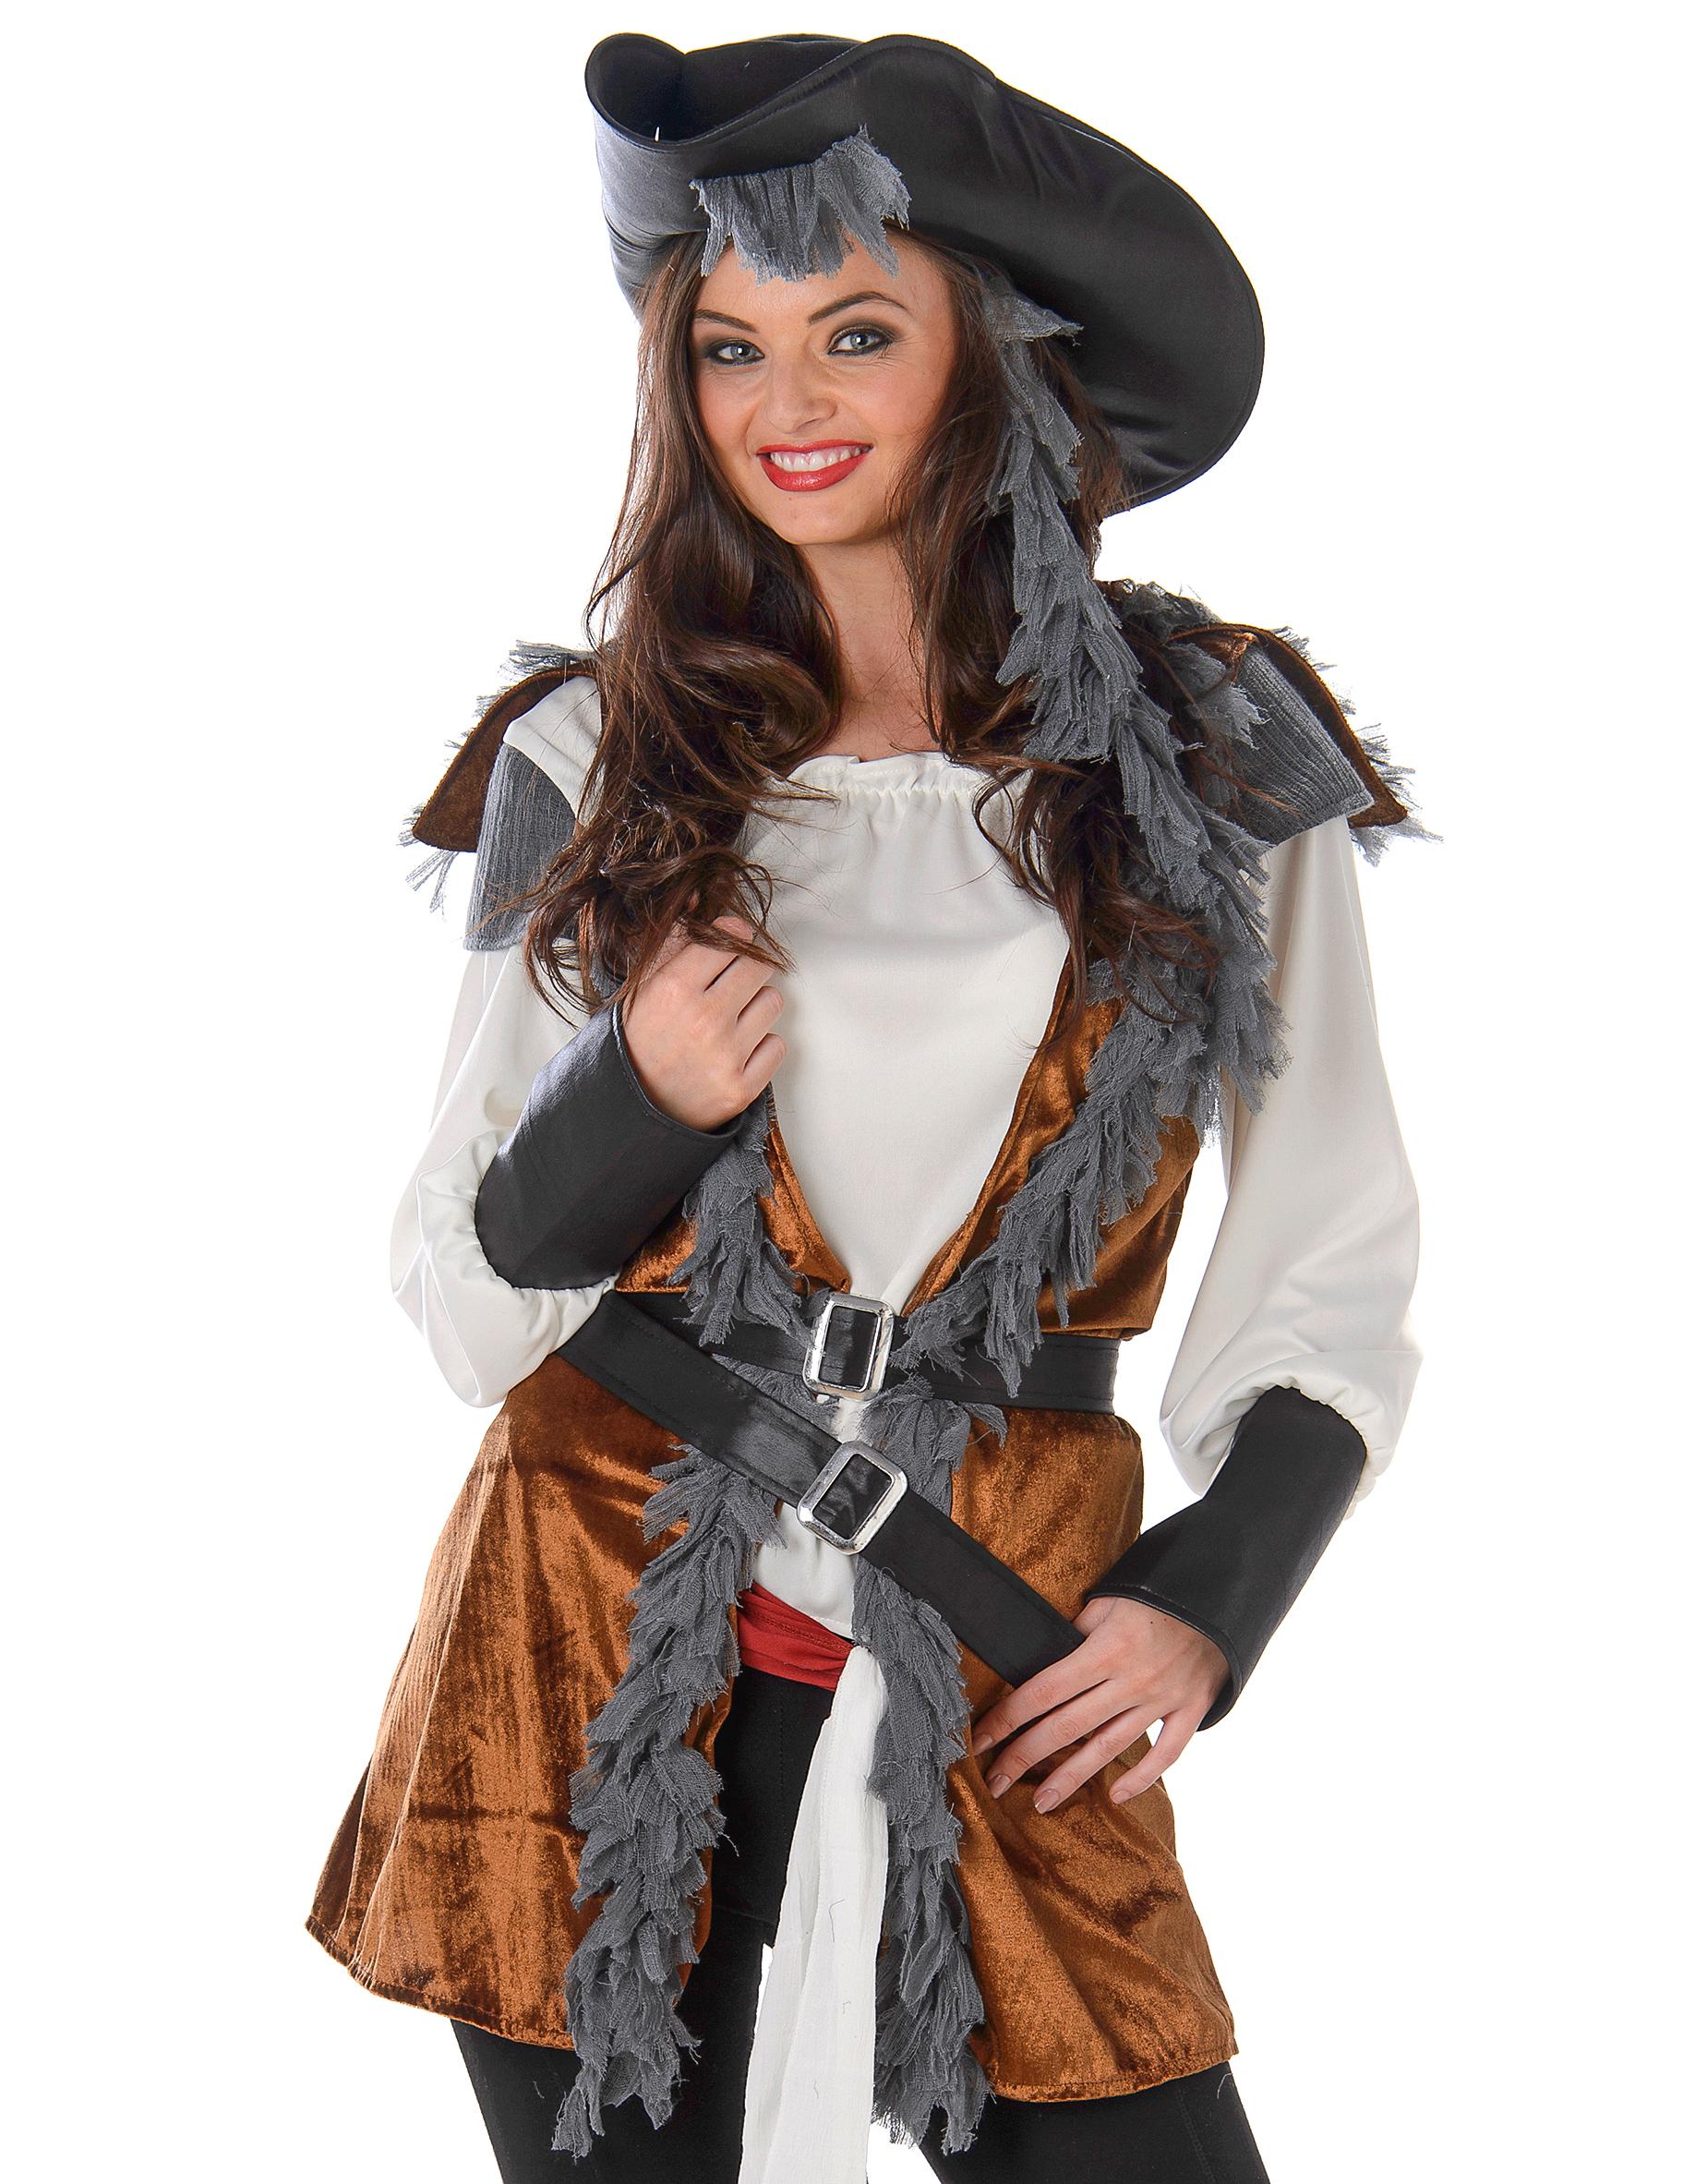 elegante piratin damenkost m braun weiss g nstige faschings kost me bei karneval megastore. Black Bedroom Furniture Sets. Home Design Ideas